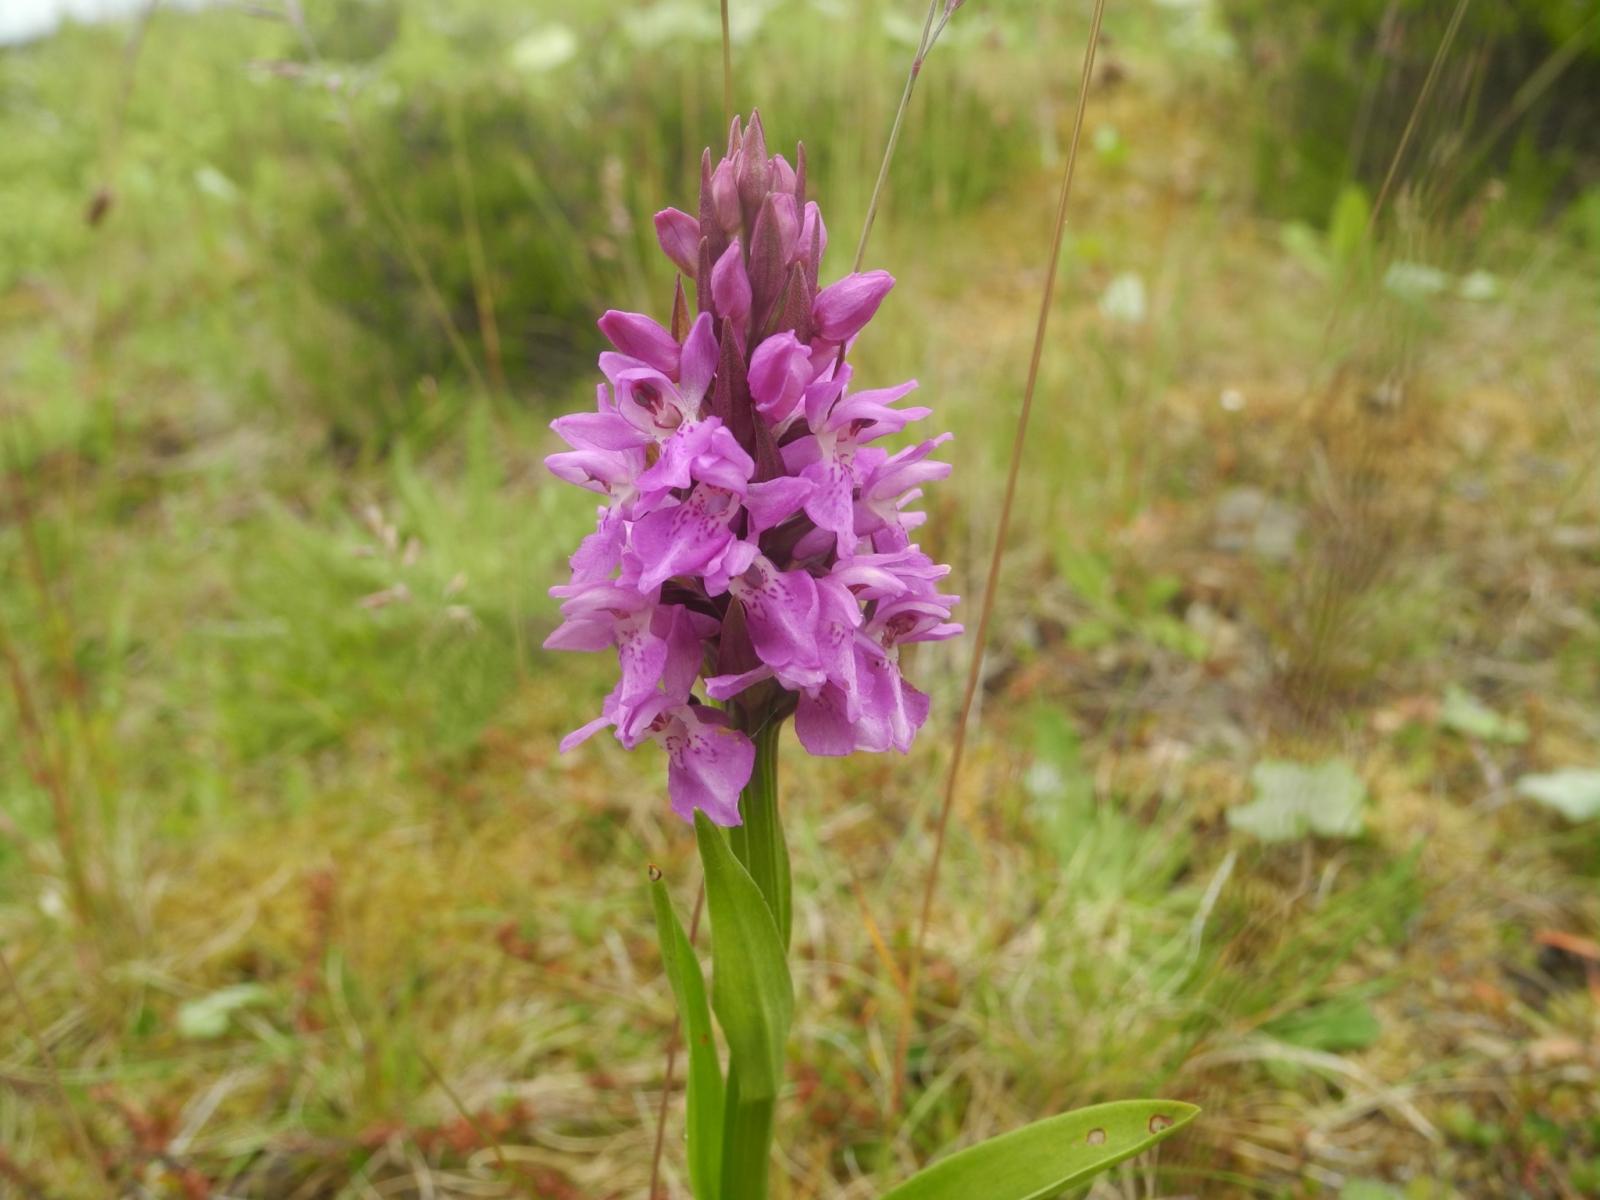 Southern Marsh Orchid (Dactylorhiza praetermissa), Pleasley Country Park, Derbys.